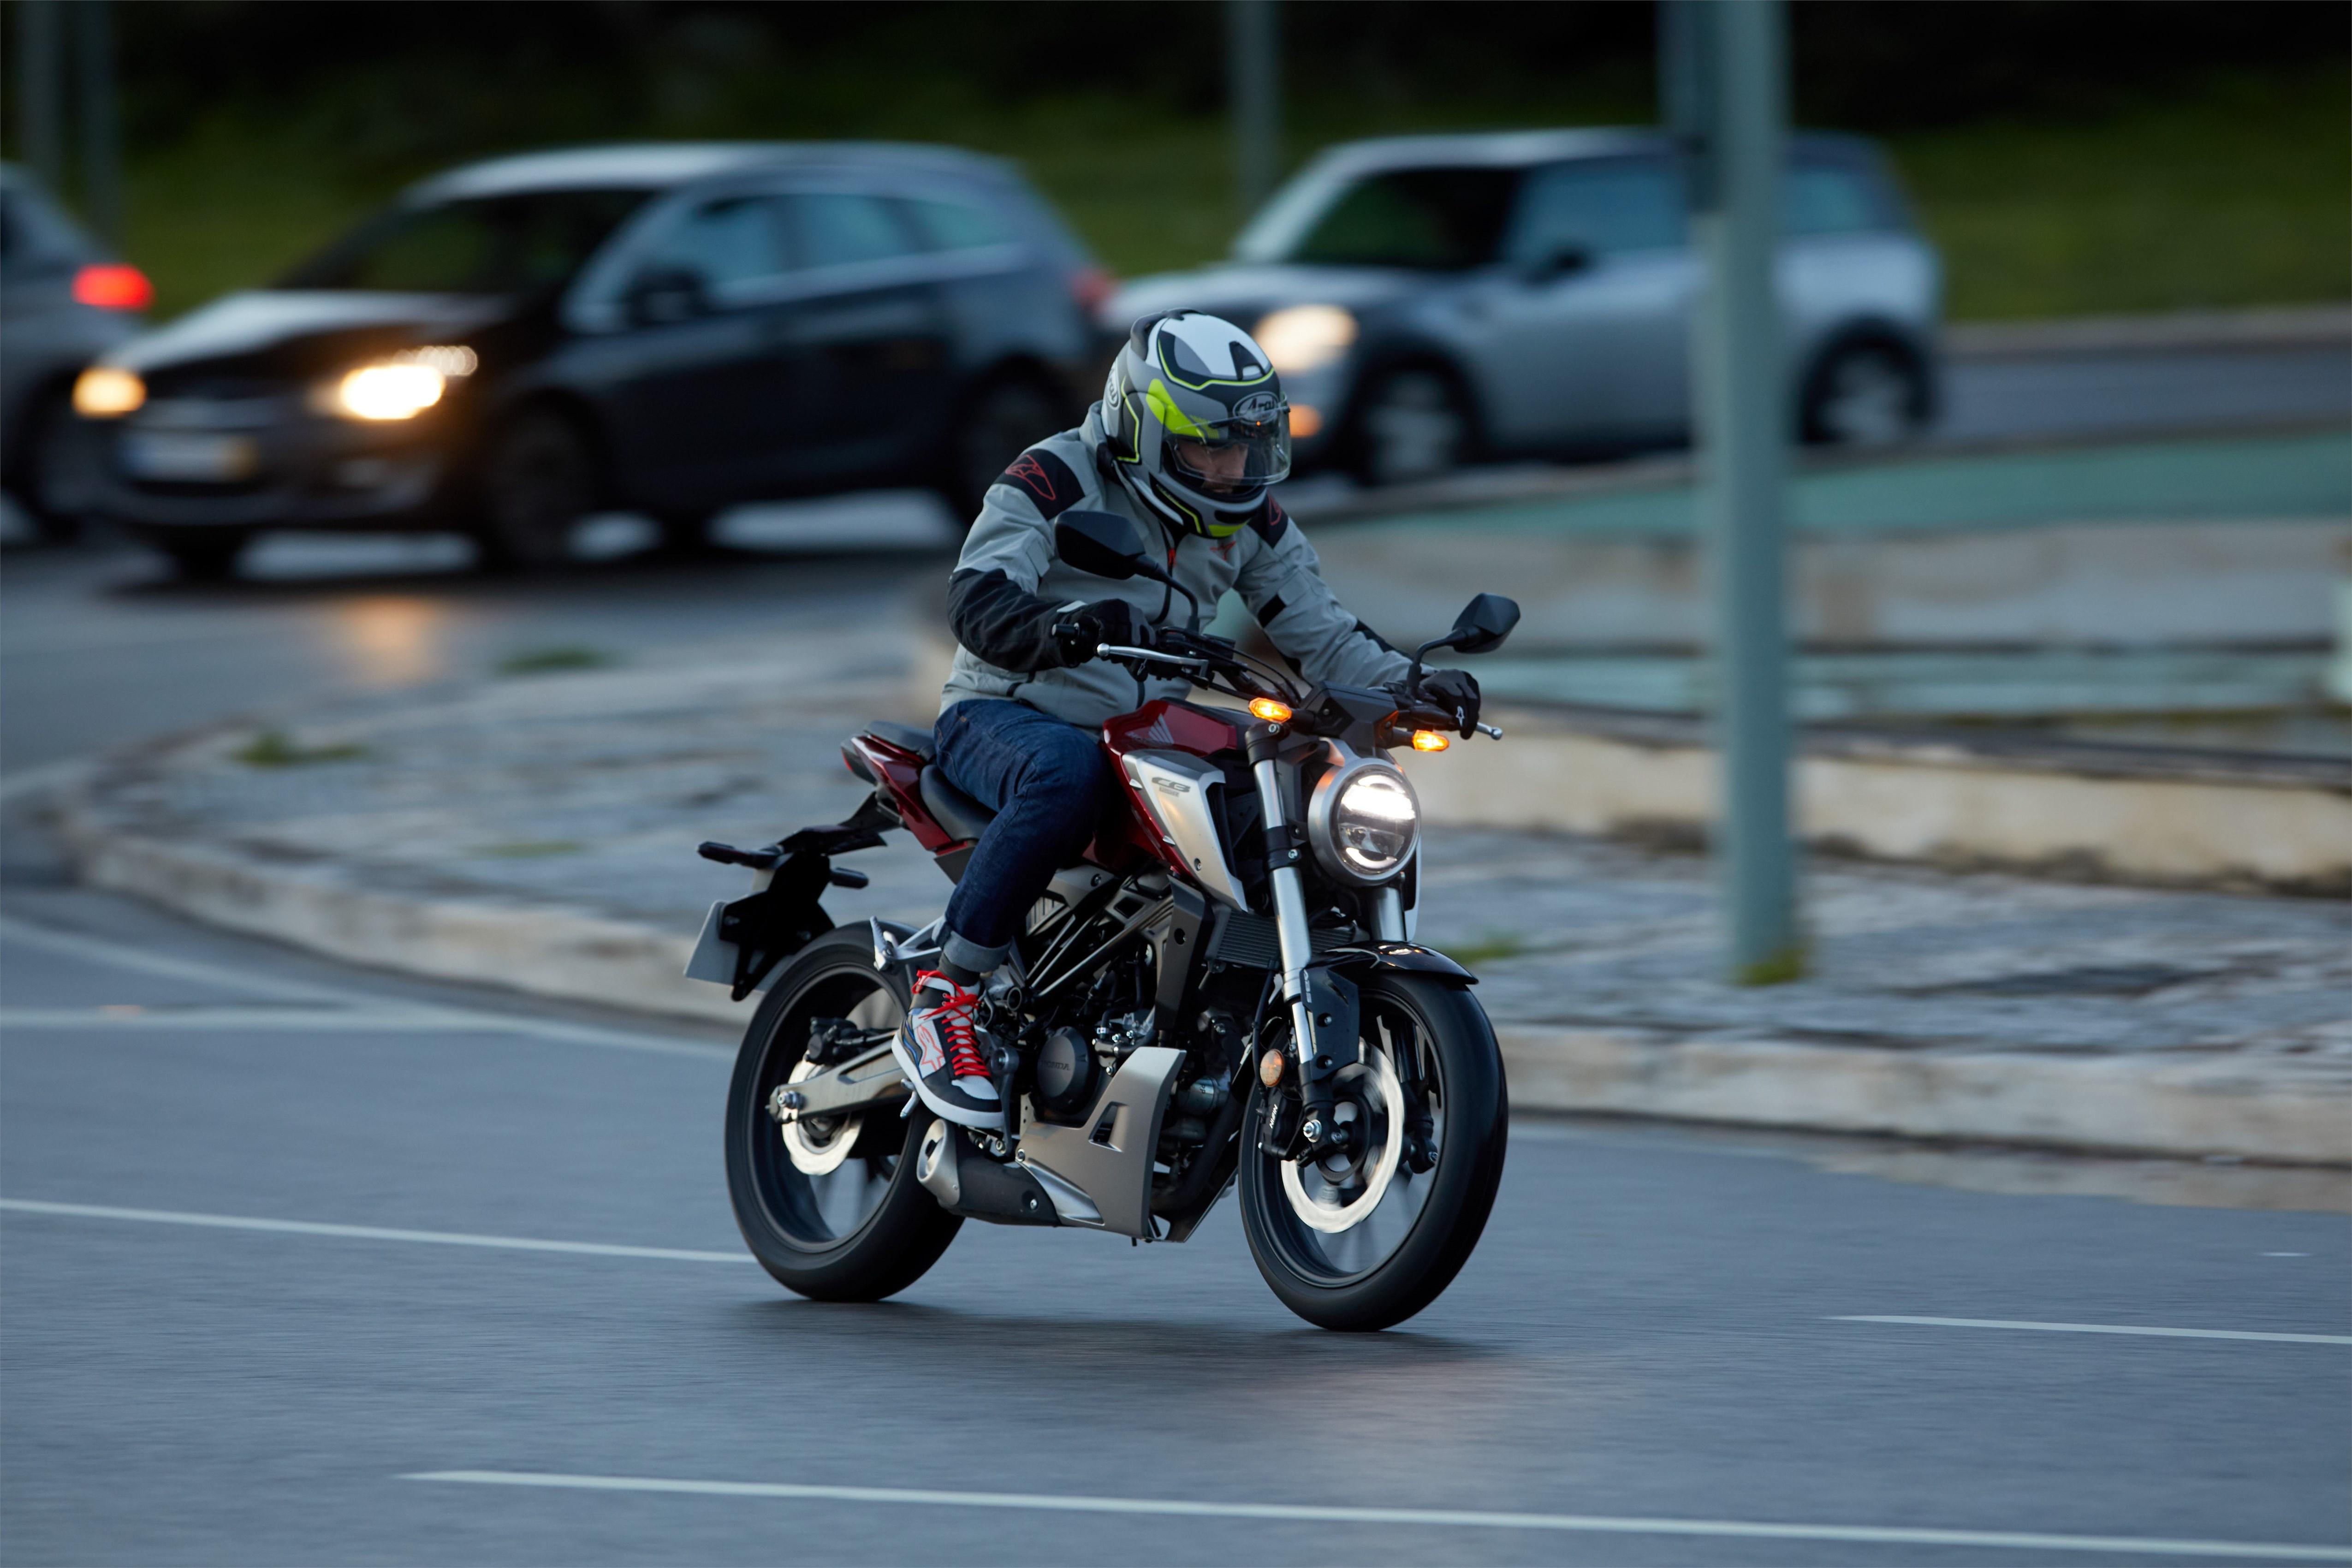 Wide bars make the bike easy to control